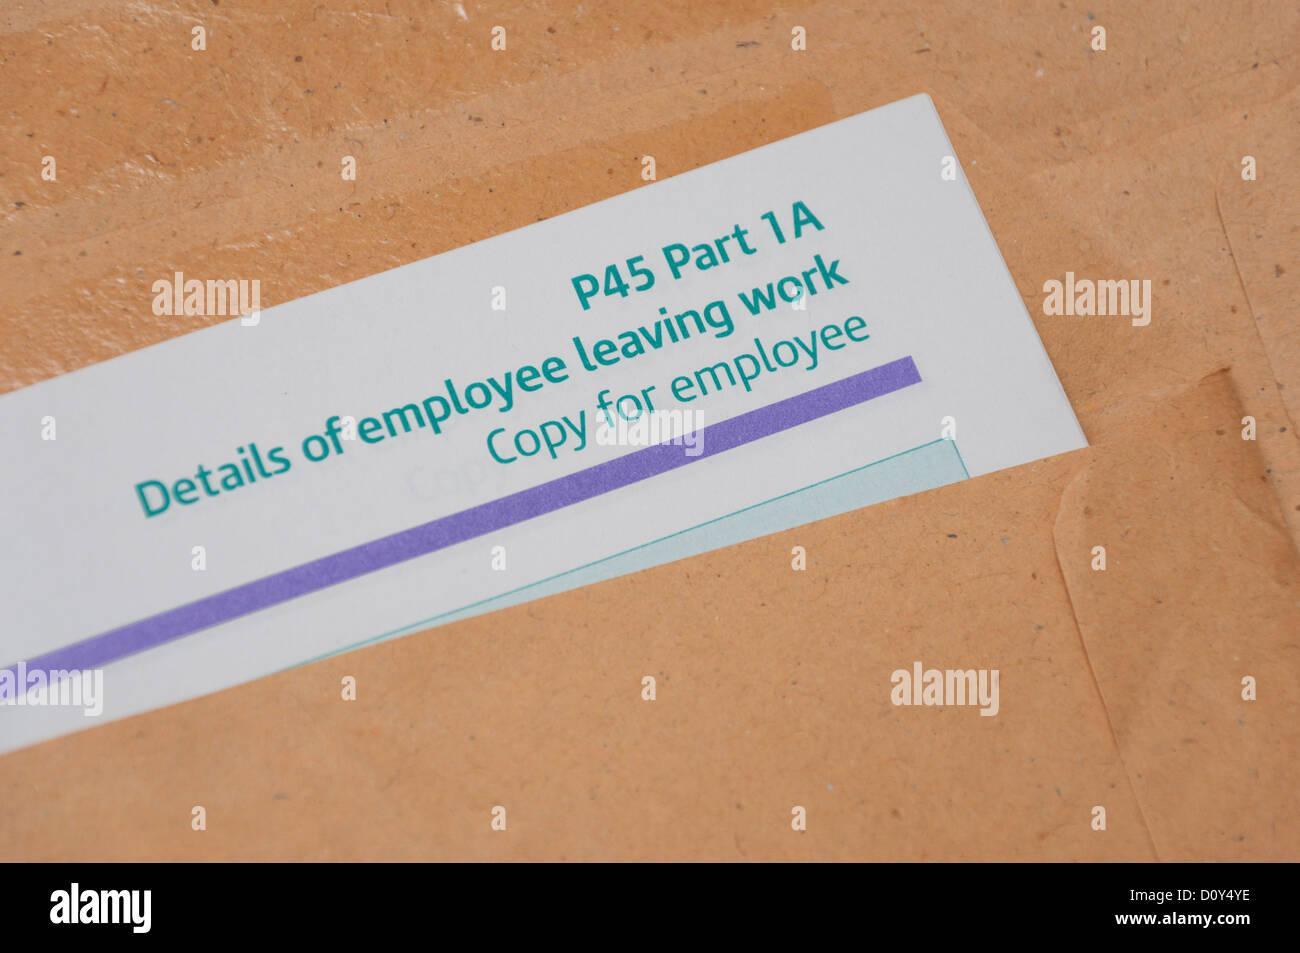 P45 Employee Leaving Work Form.